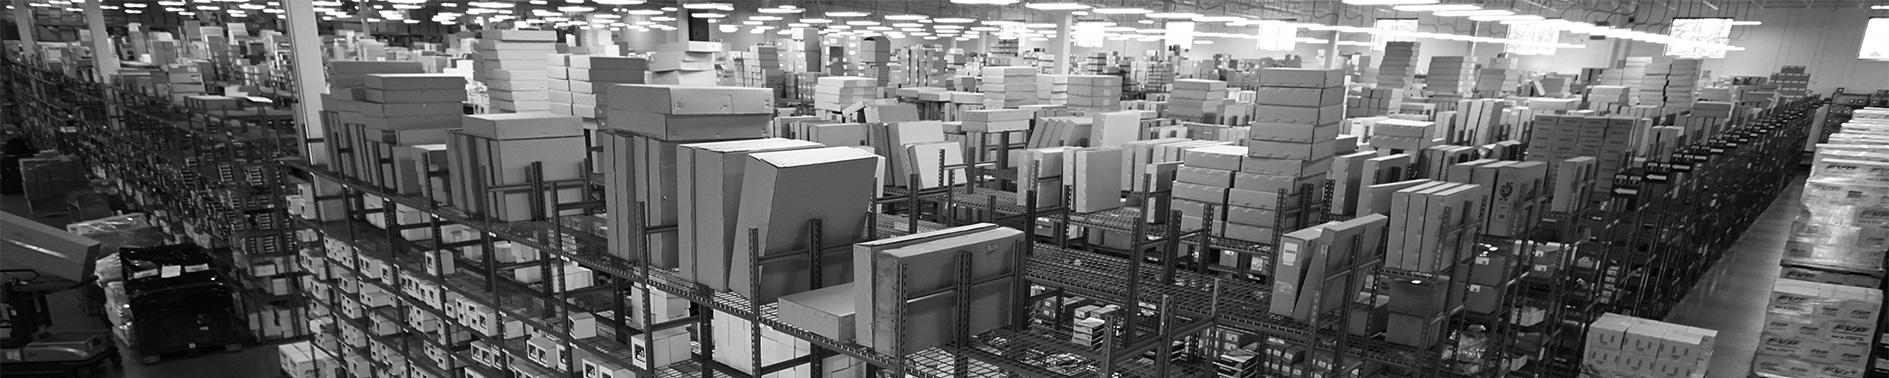 Warehouse shelving ProductsBanner